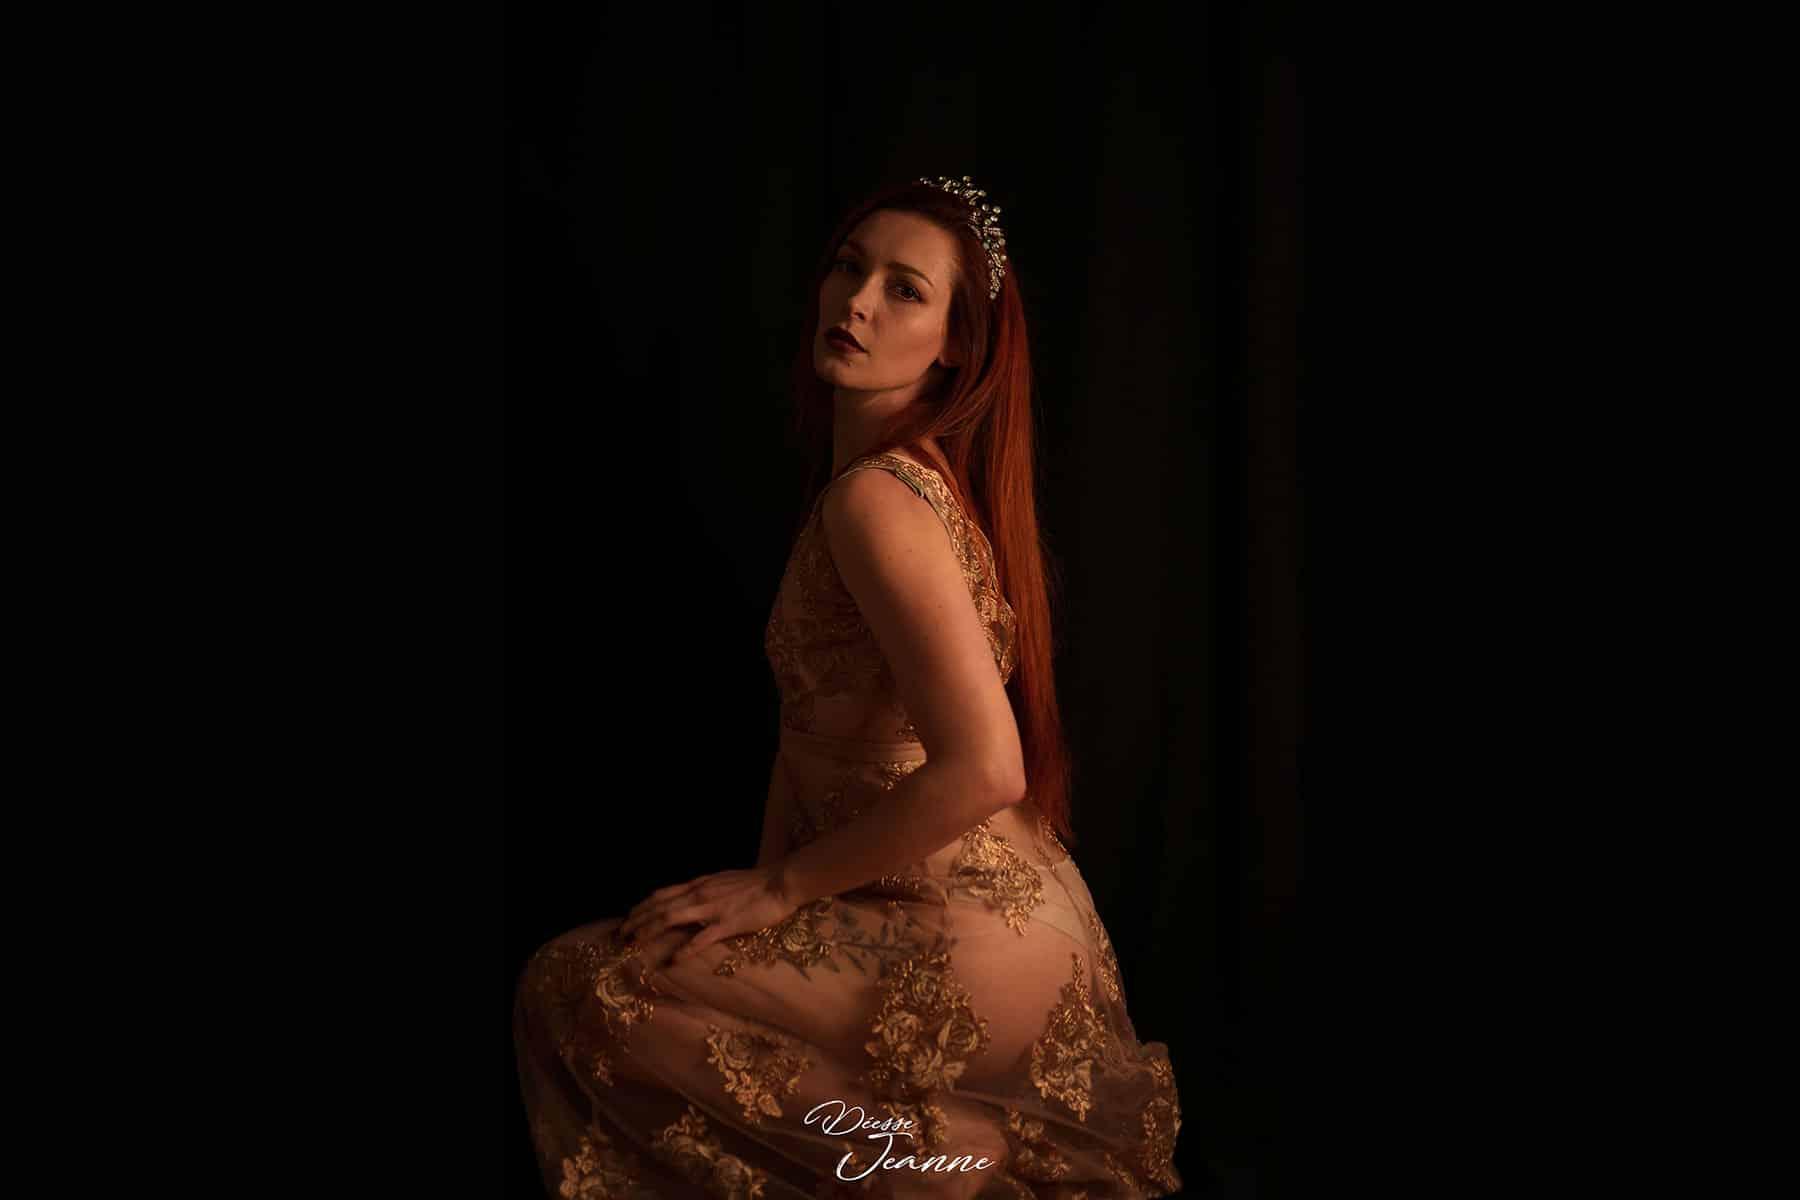 french goddess redhead